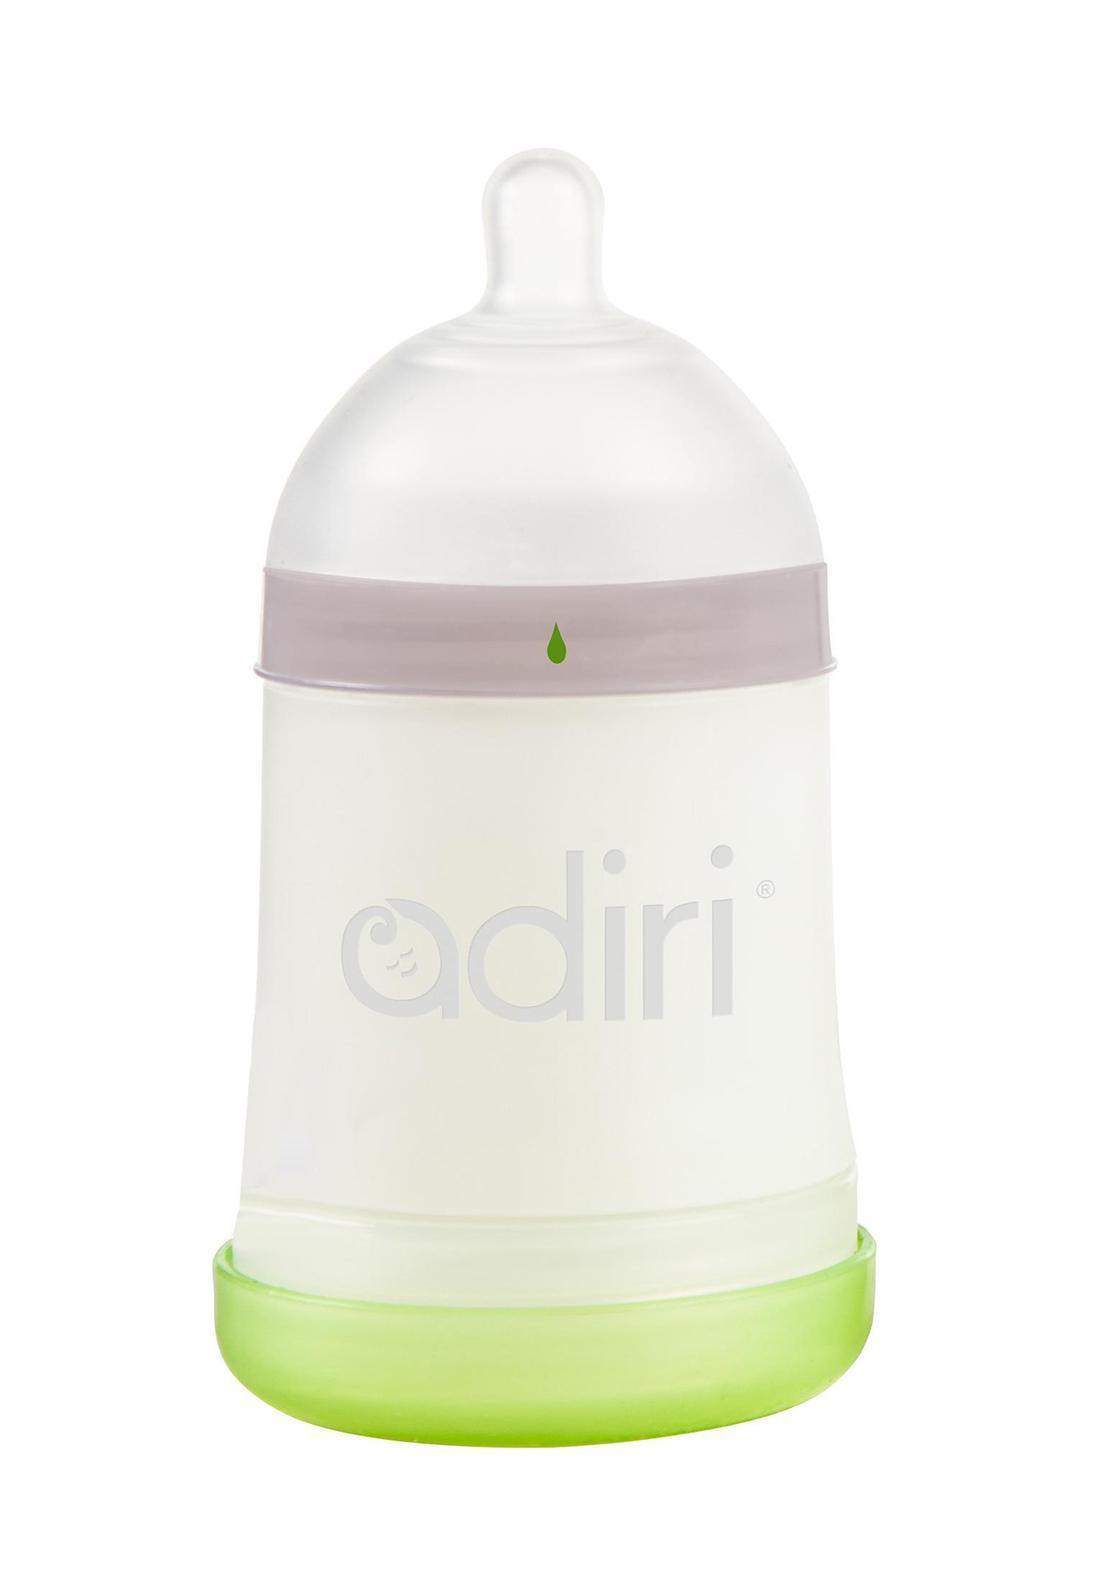 ������� ��������� Adiri NxGen Newborn Nurser White, 0-3 ���., 163 ��. - AdiriAD004WT-001C/0-3����������� ������� ��������� Adiri NxGen Newborn Nurser �� ������ ������� ������� � ������ ������������ ������������-���������, ������ � ������������ �� �������� �������������. ����������, ������� ������������ � ������������, ��������